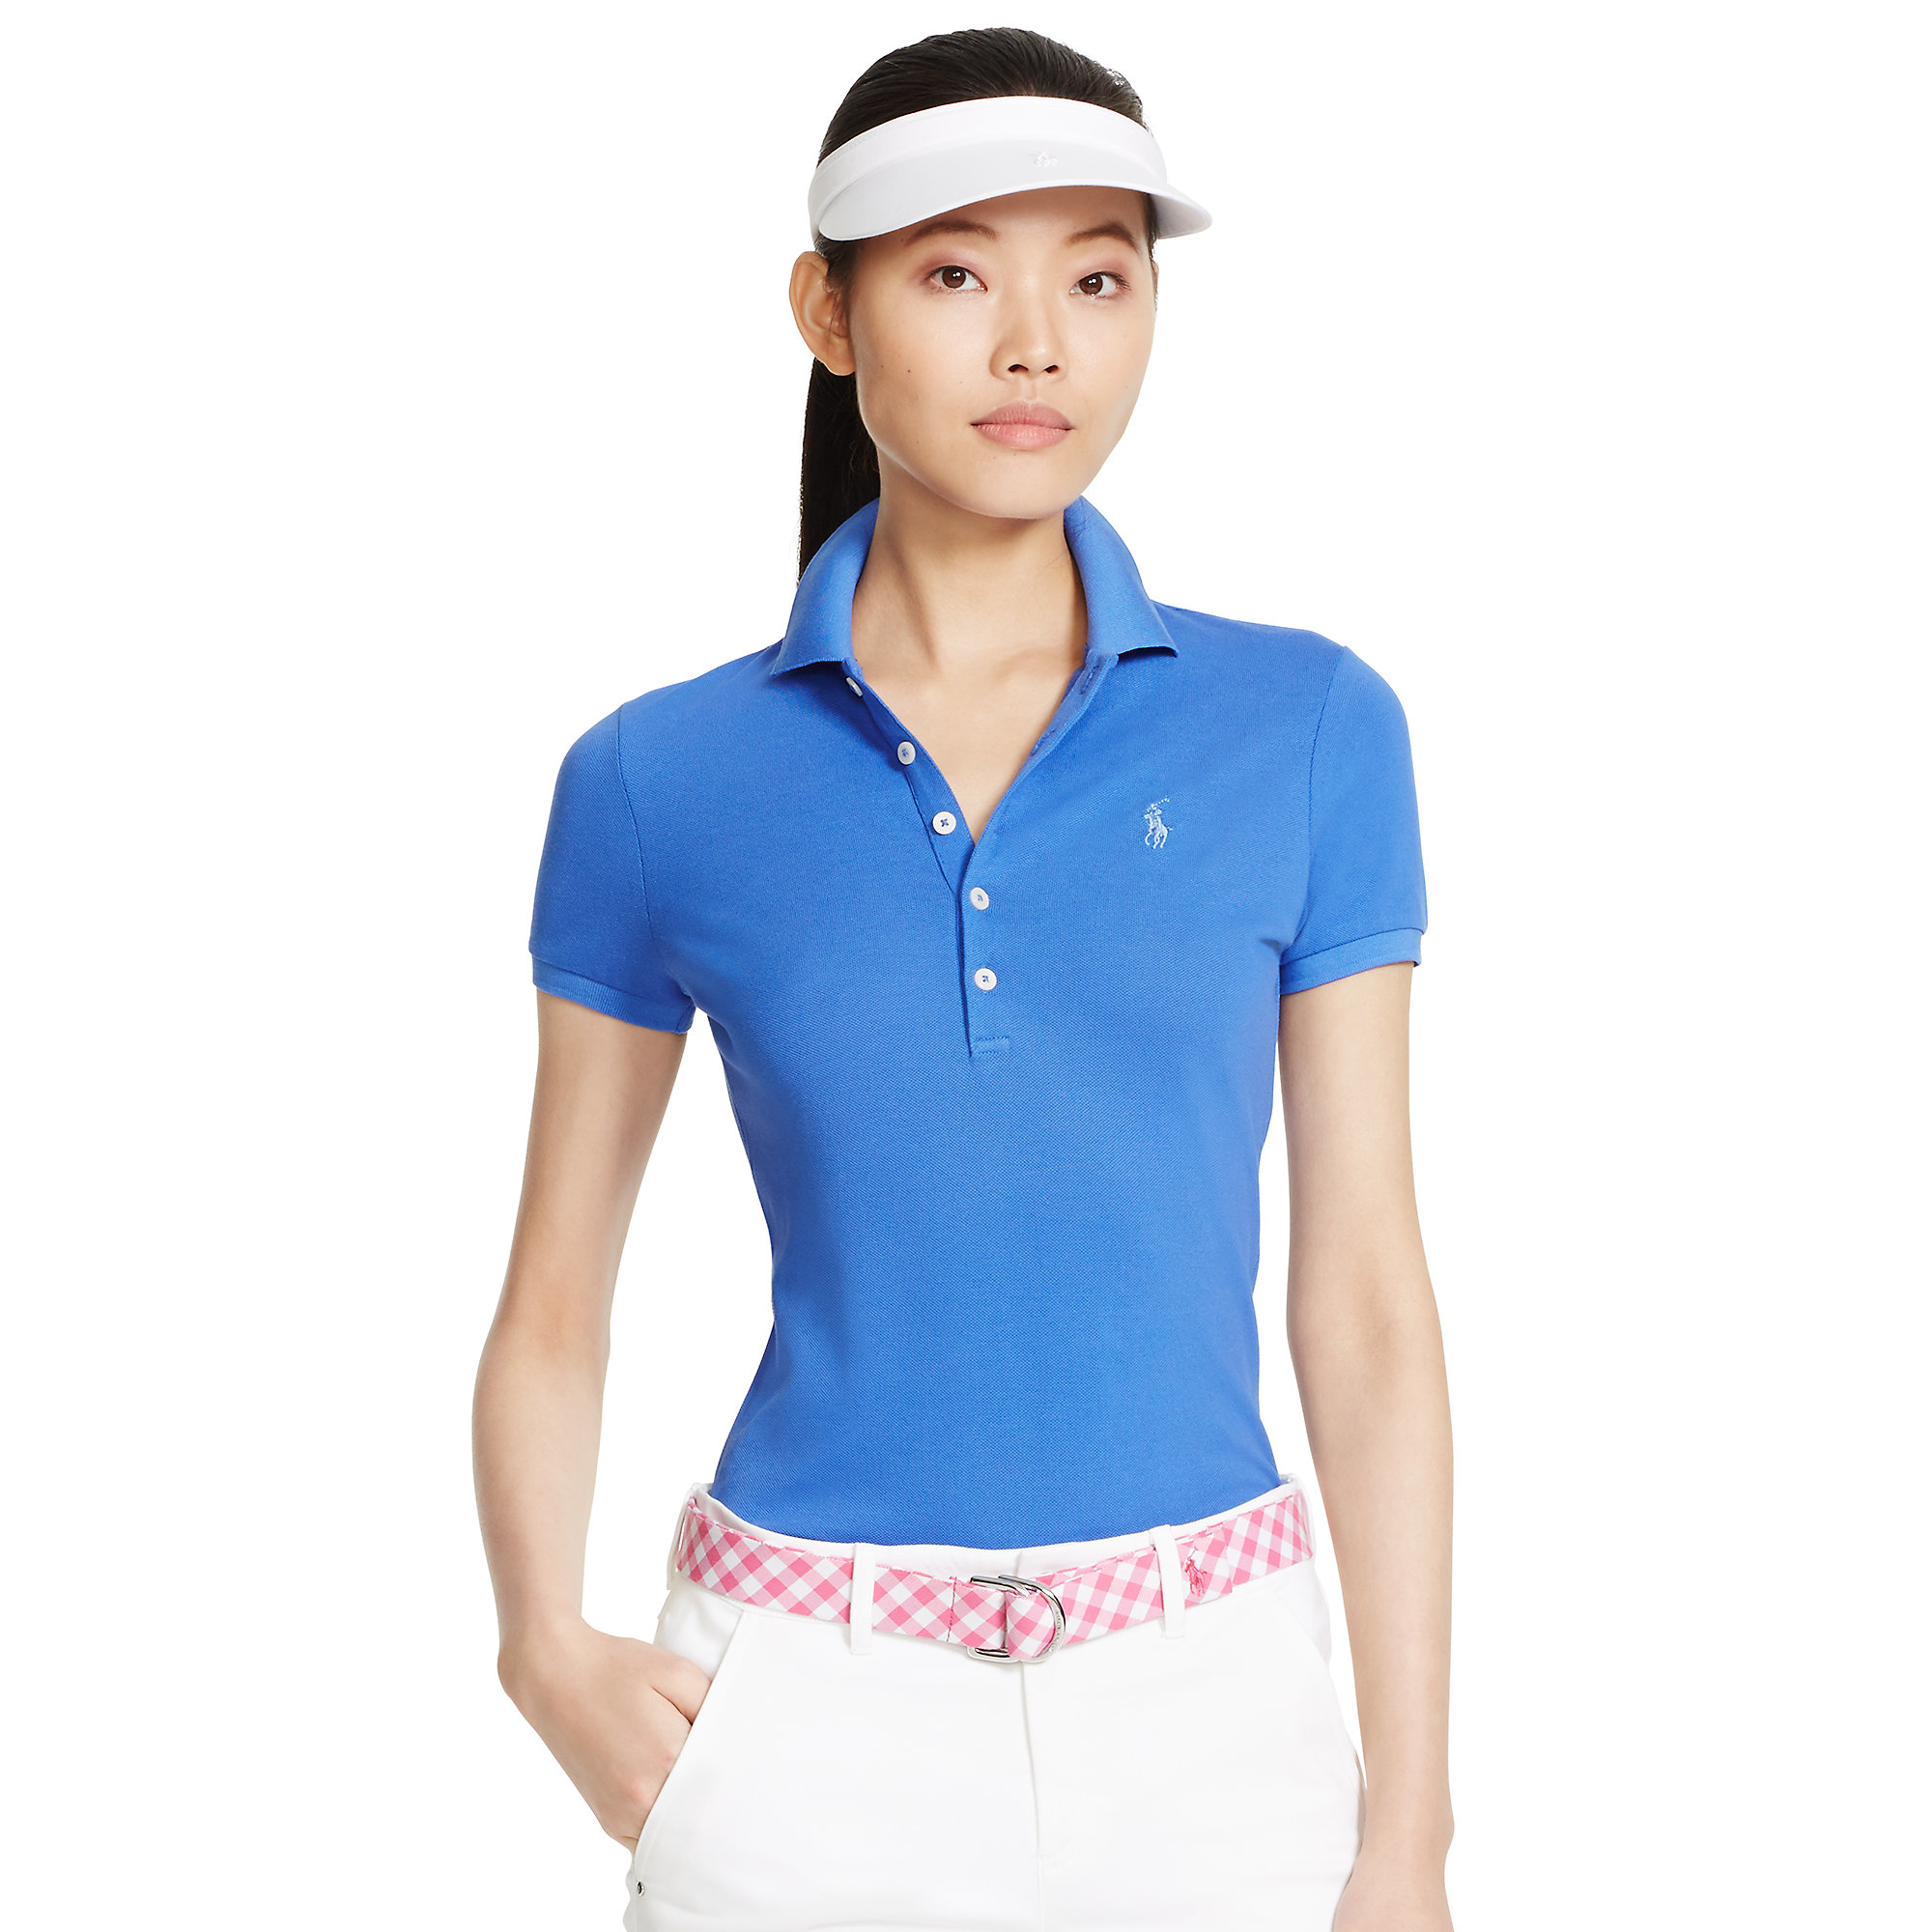 ralph lauren golf slim fit cotton mesh polo in blue lyst. Black Bedroom Furniture Sets. Home Design Ideas